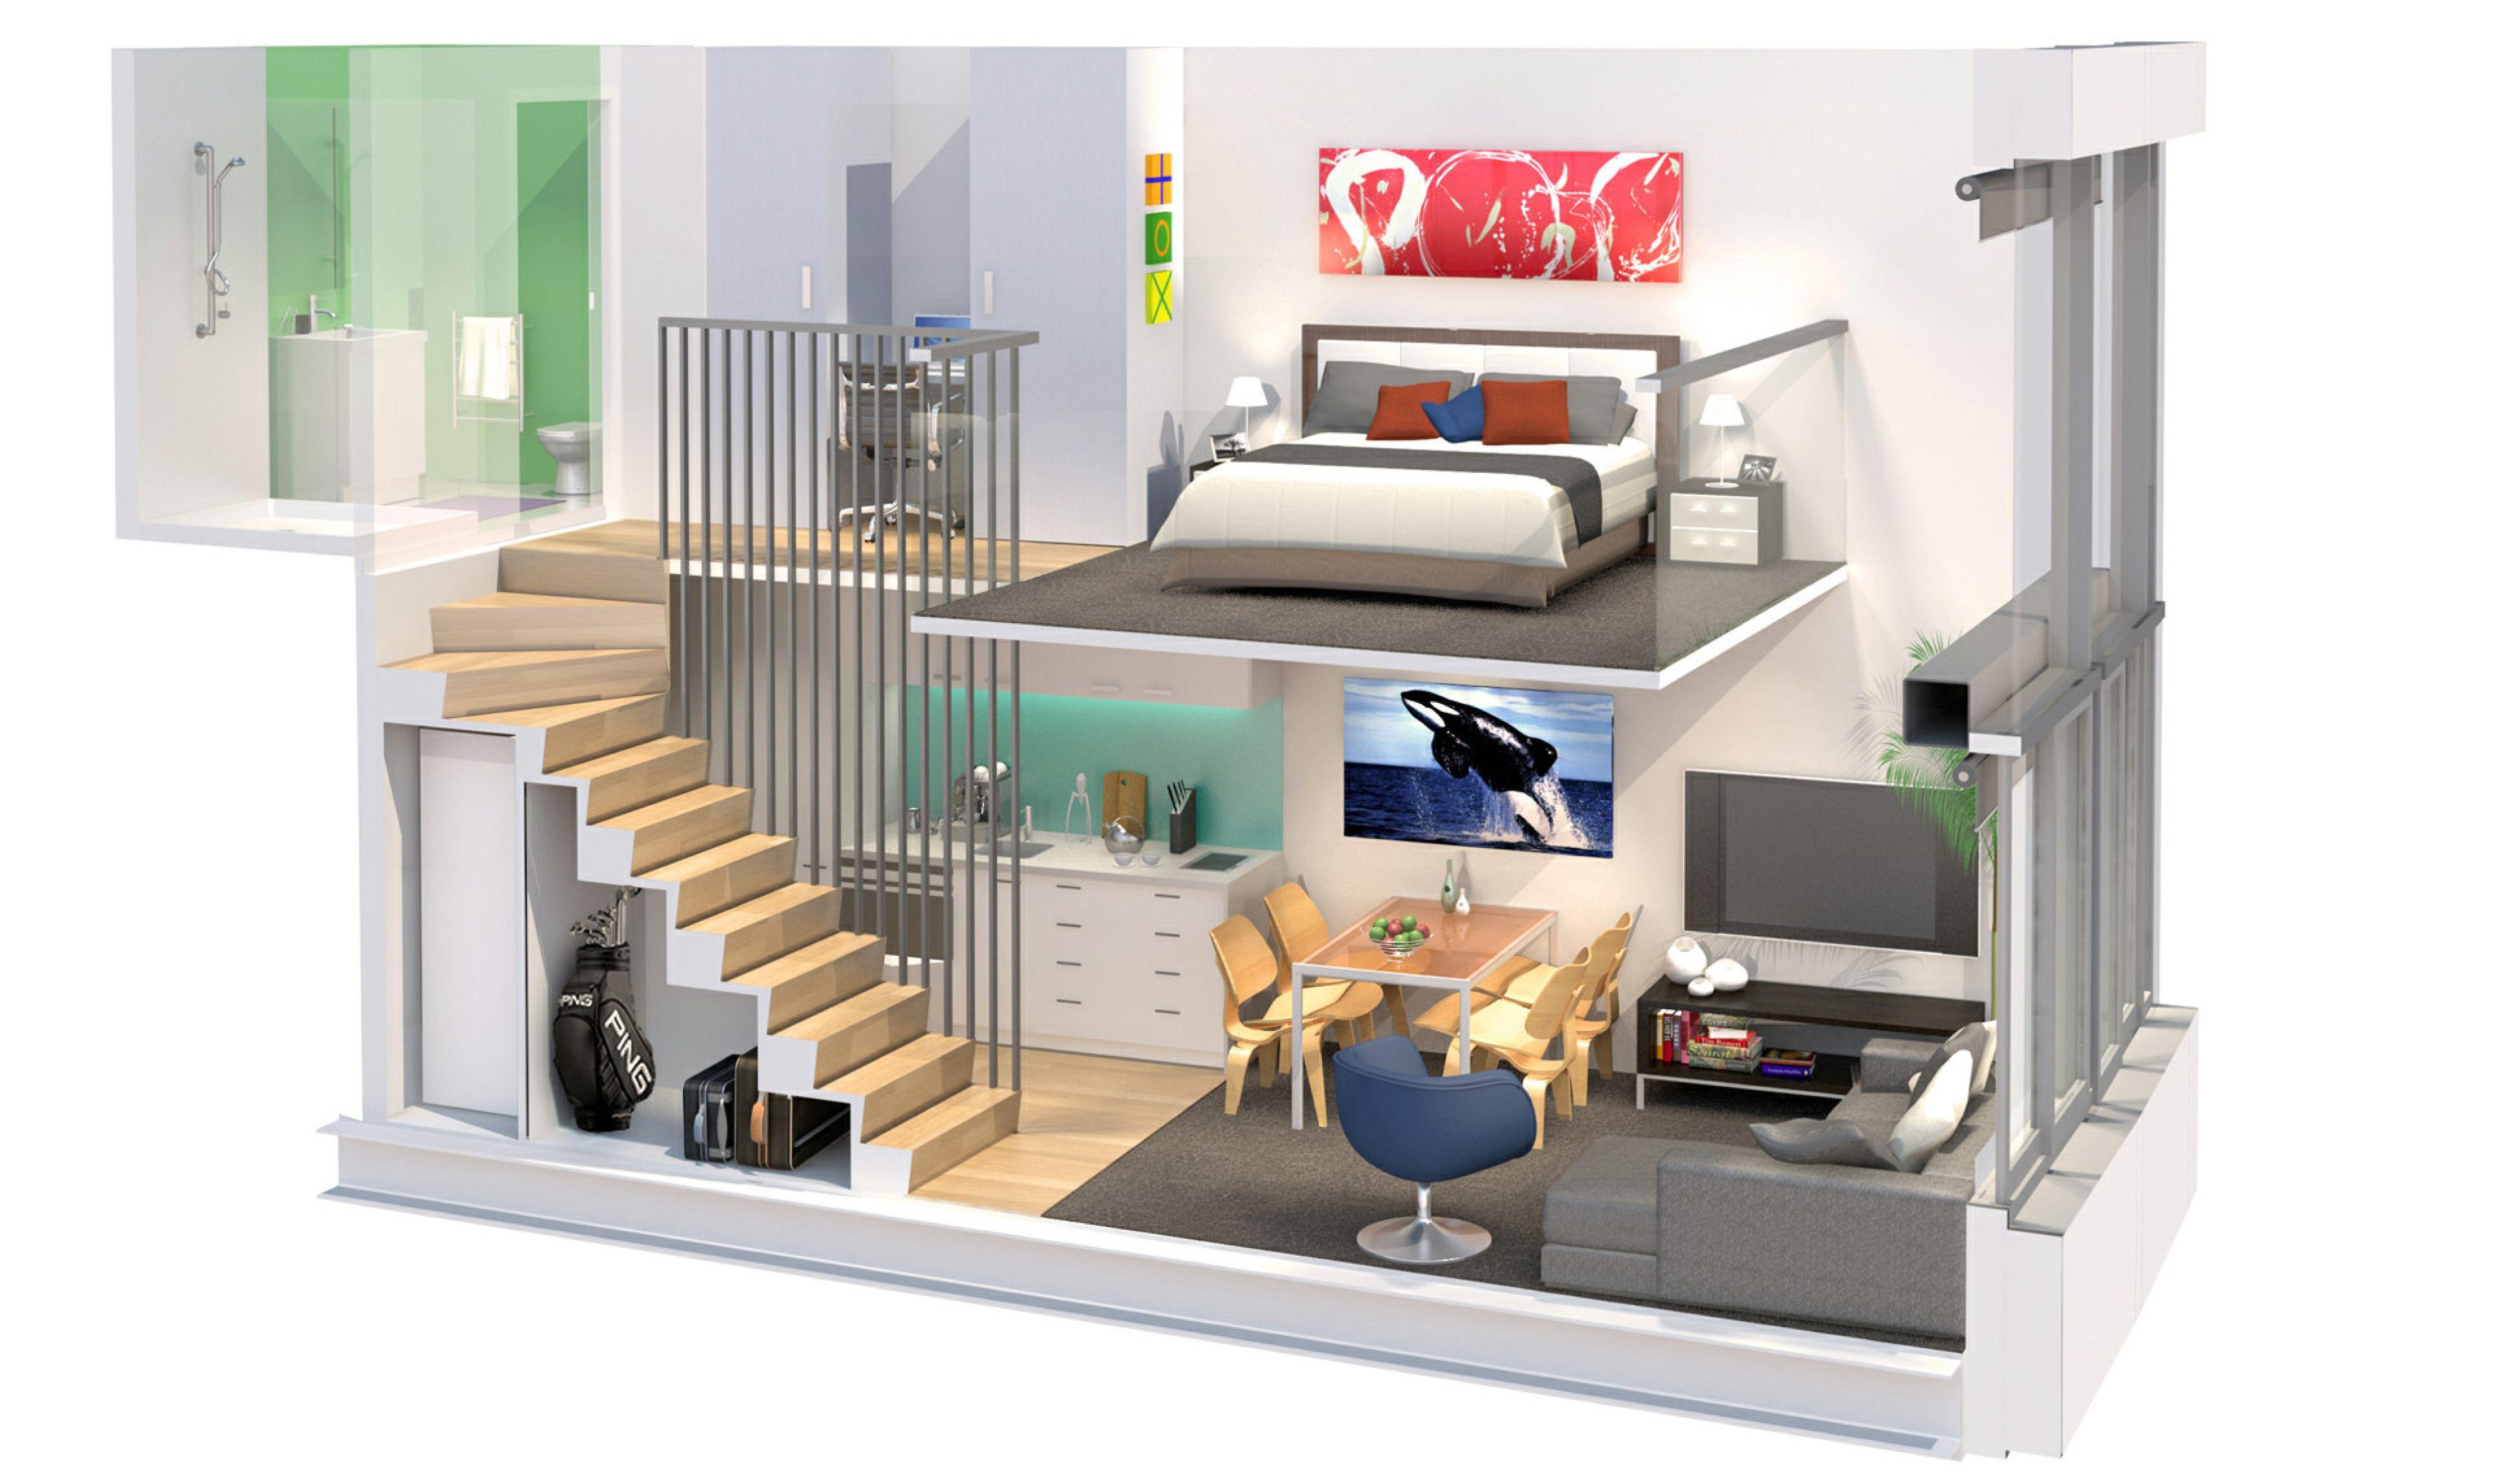 3dunit Apartment Design Tiny House Design Loft Apartment